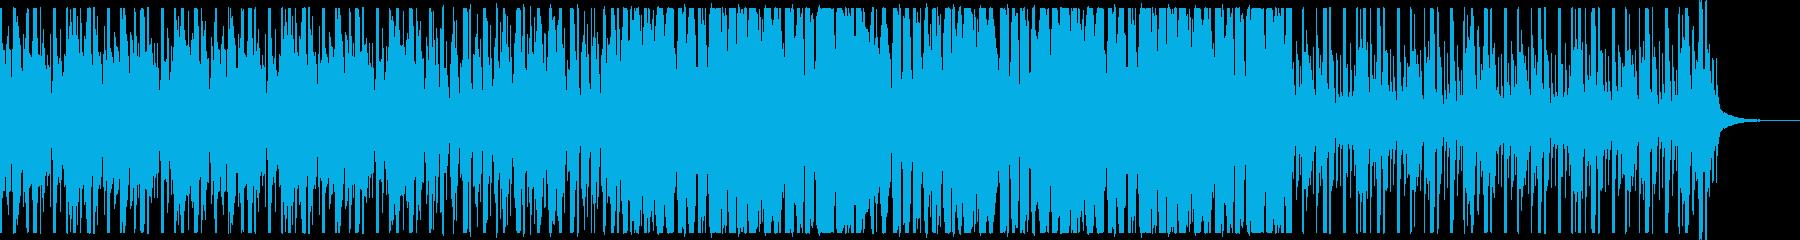 Hardcore Technoの再生済みの波形